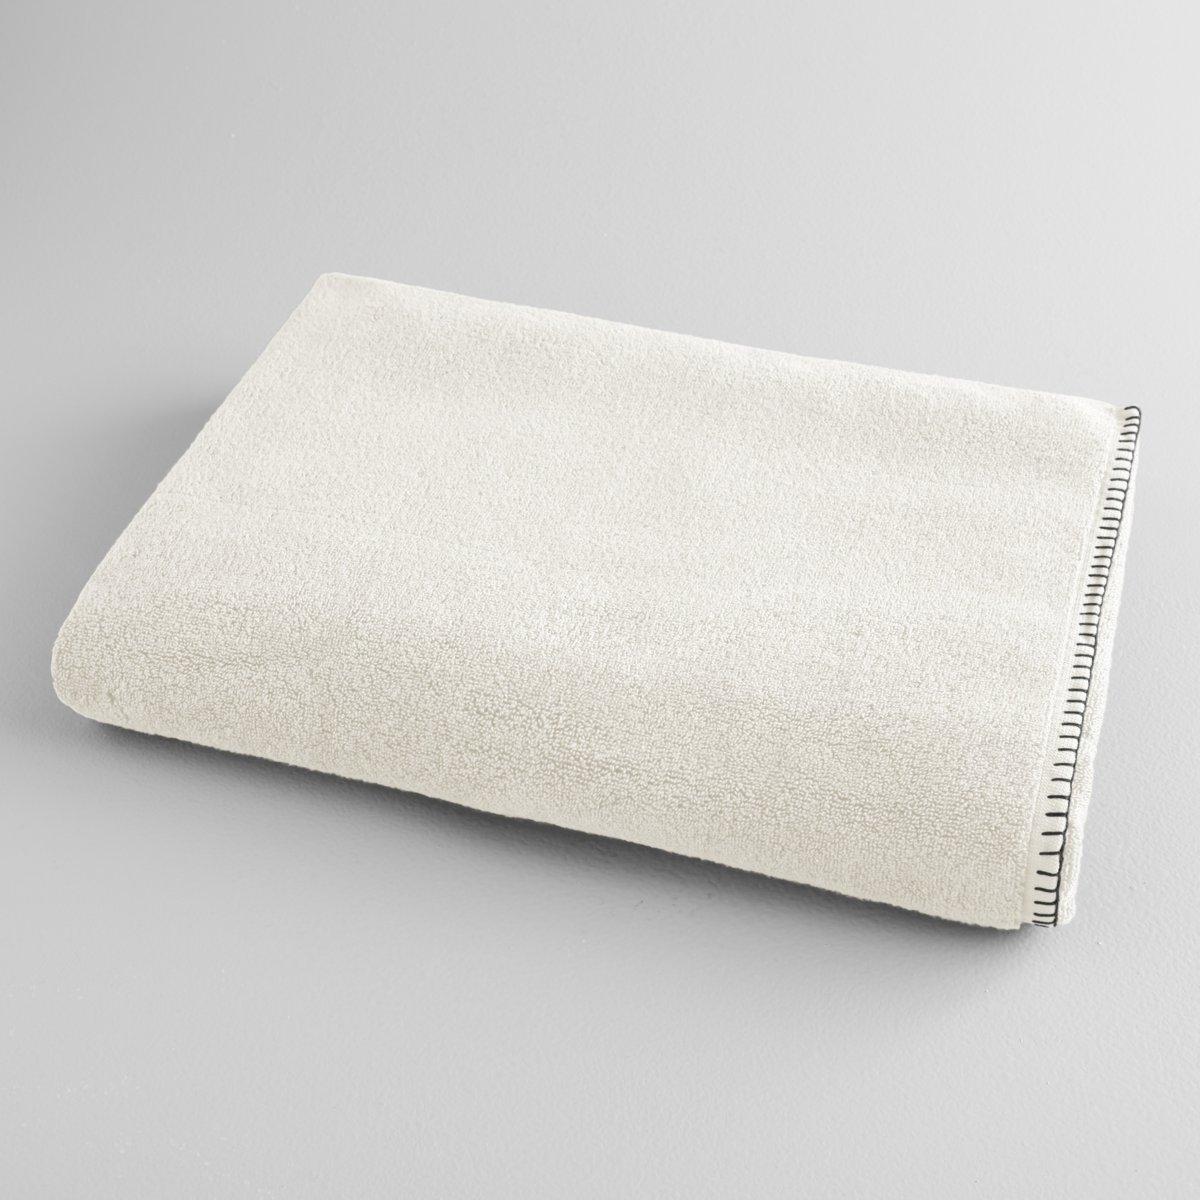 Банное полотенце  27526 от LaRedoute